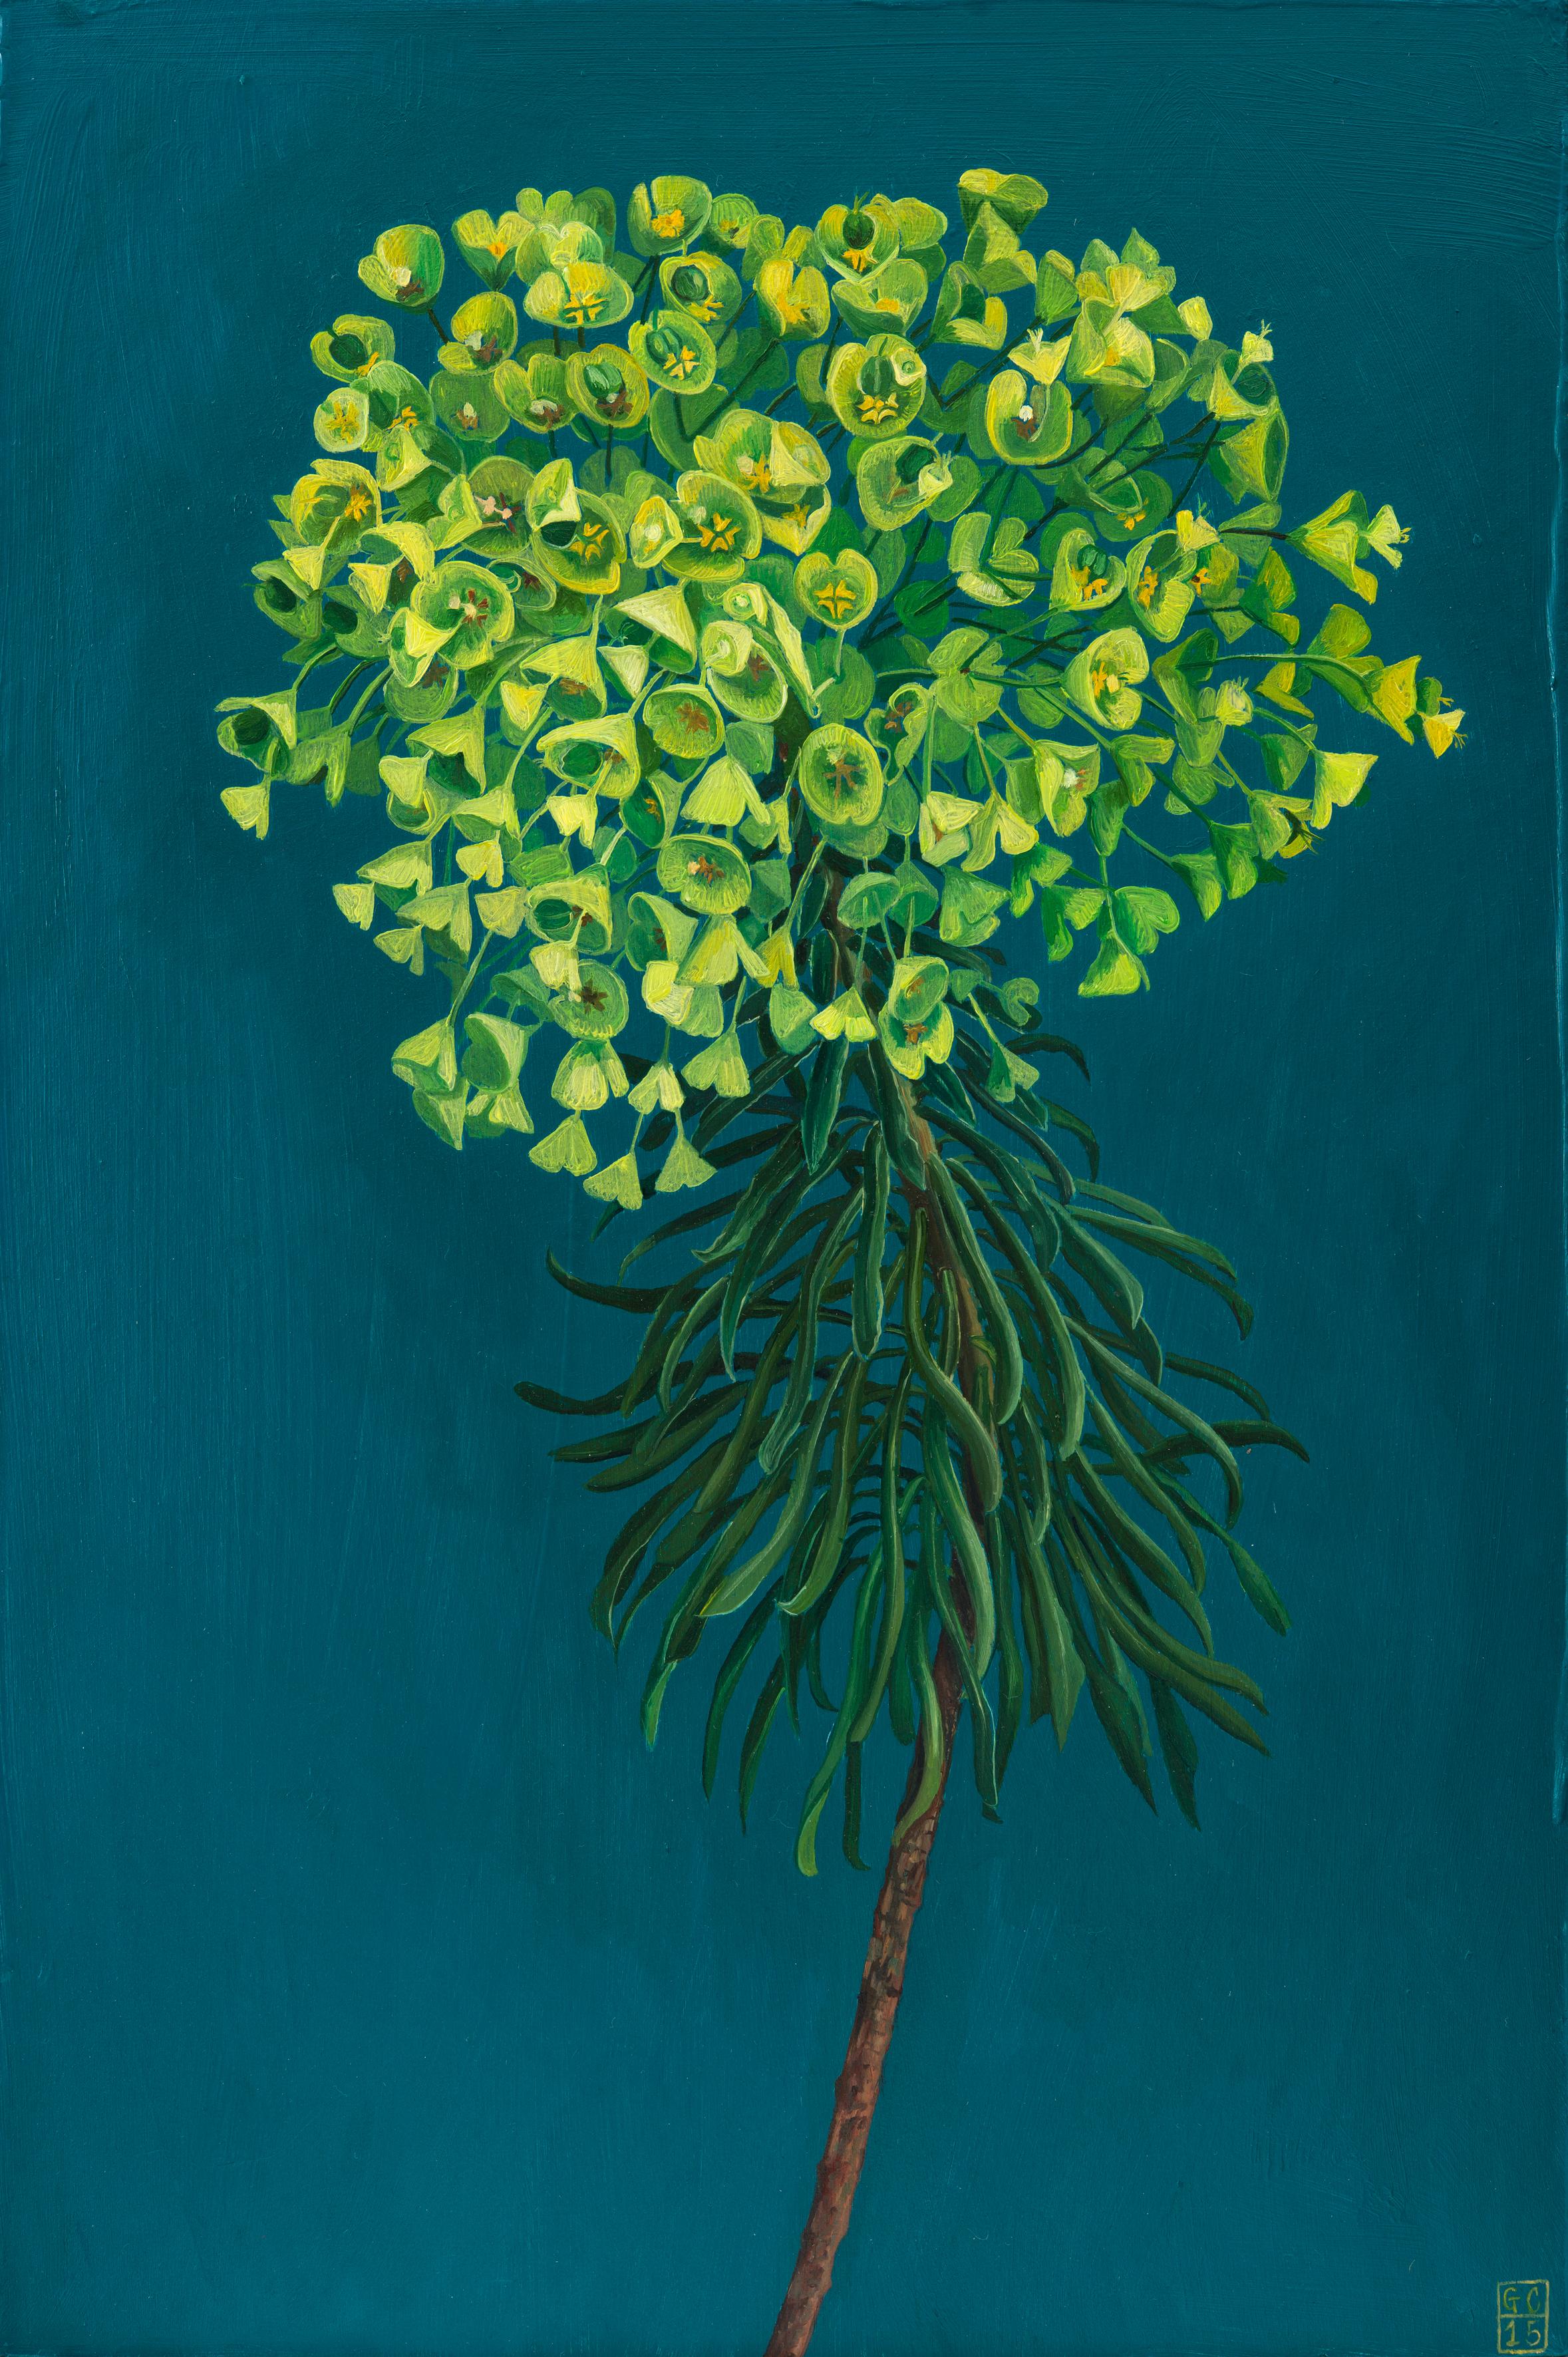 'Euphorbia', 37.5cm x25cm, Oil on Card, SOLD